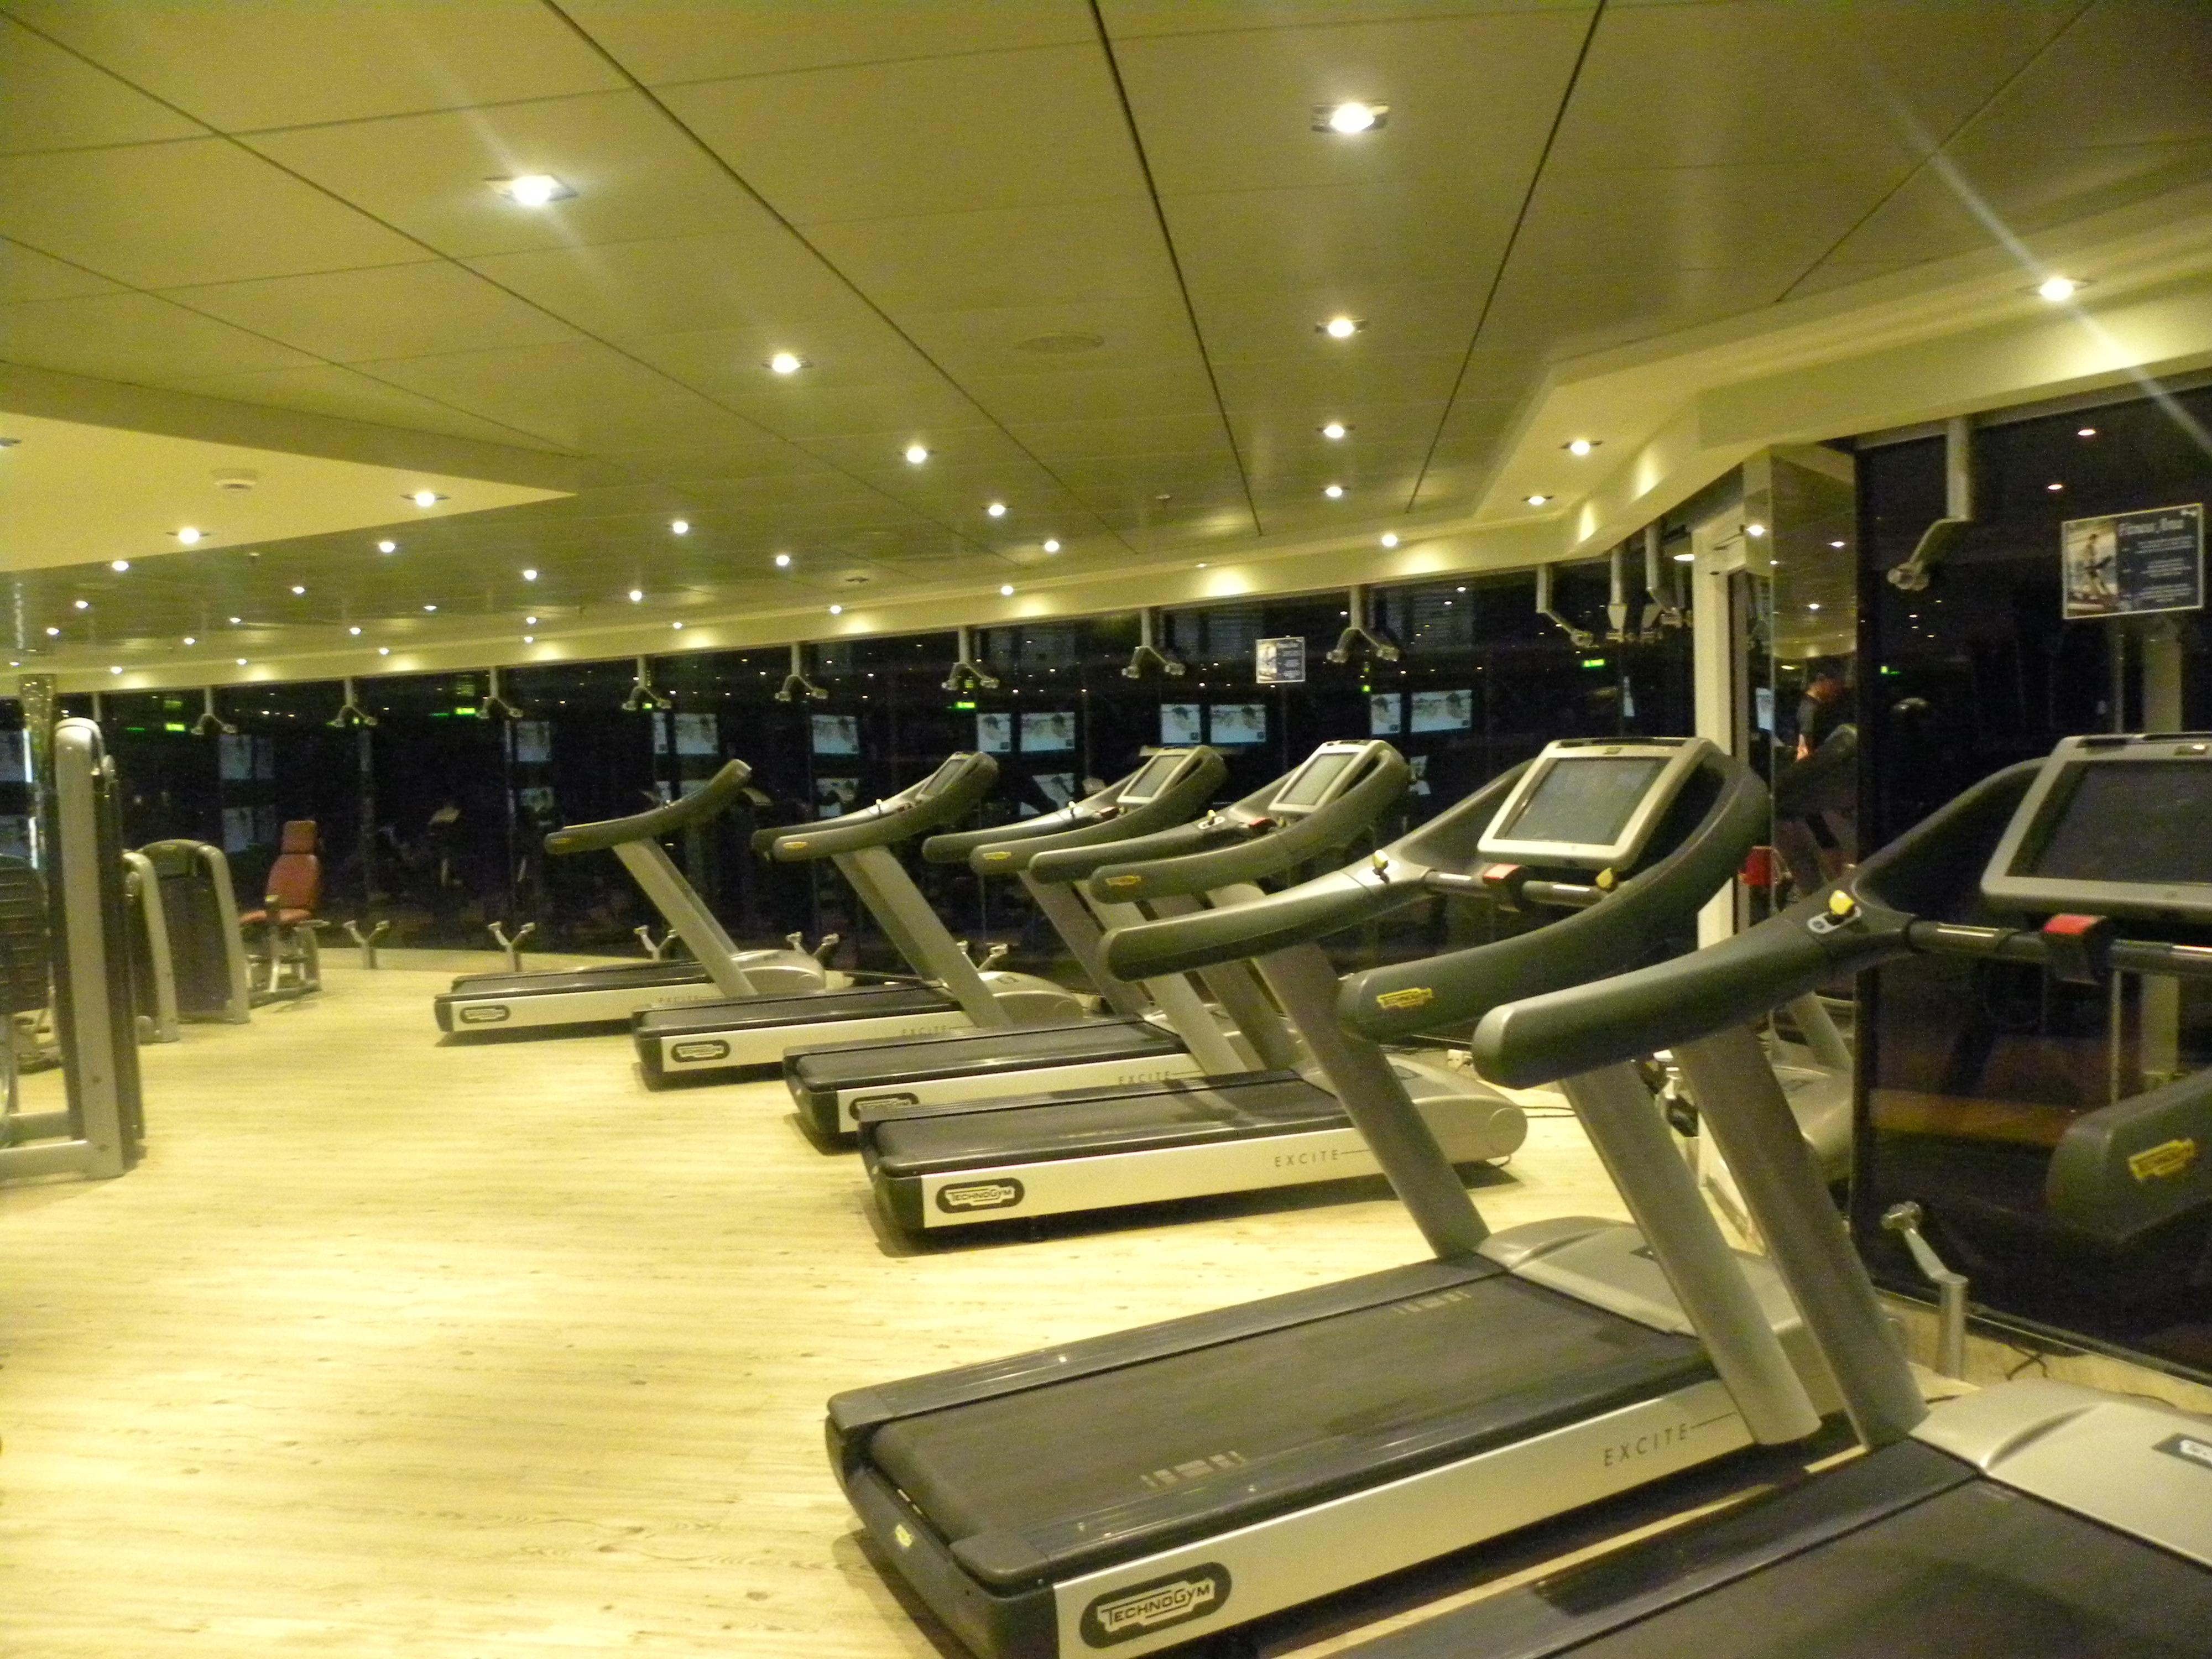 Salle de sport et fitness en front de mer du MSC FANTASIA